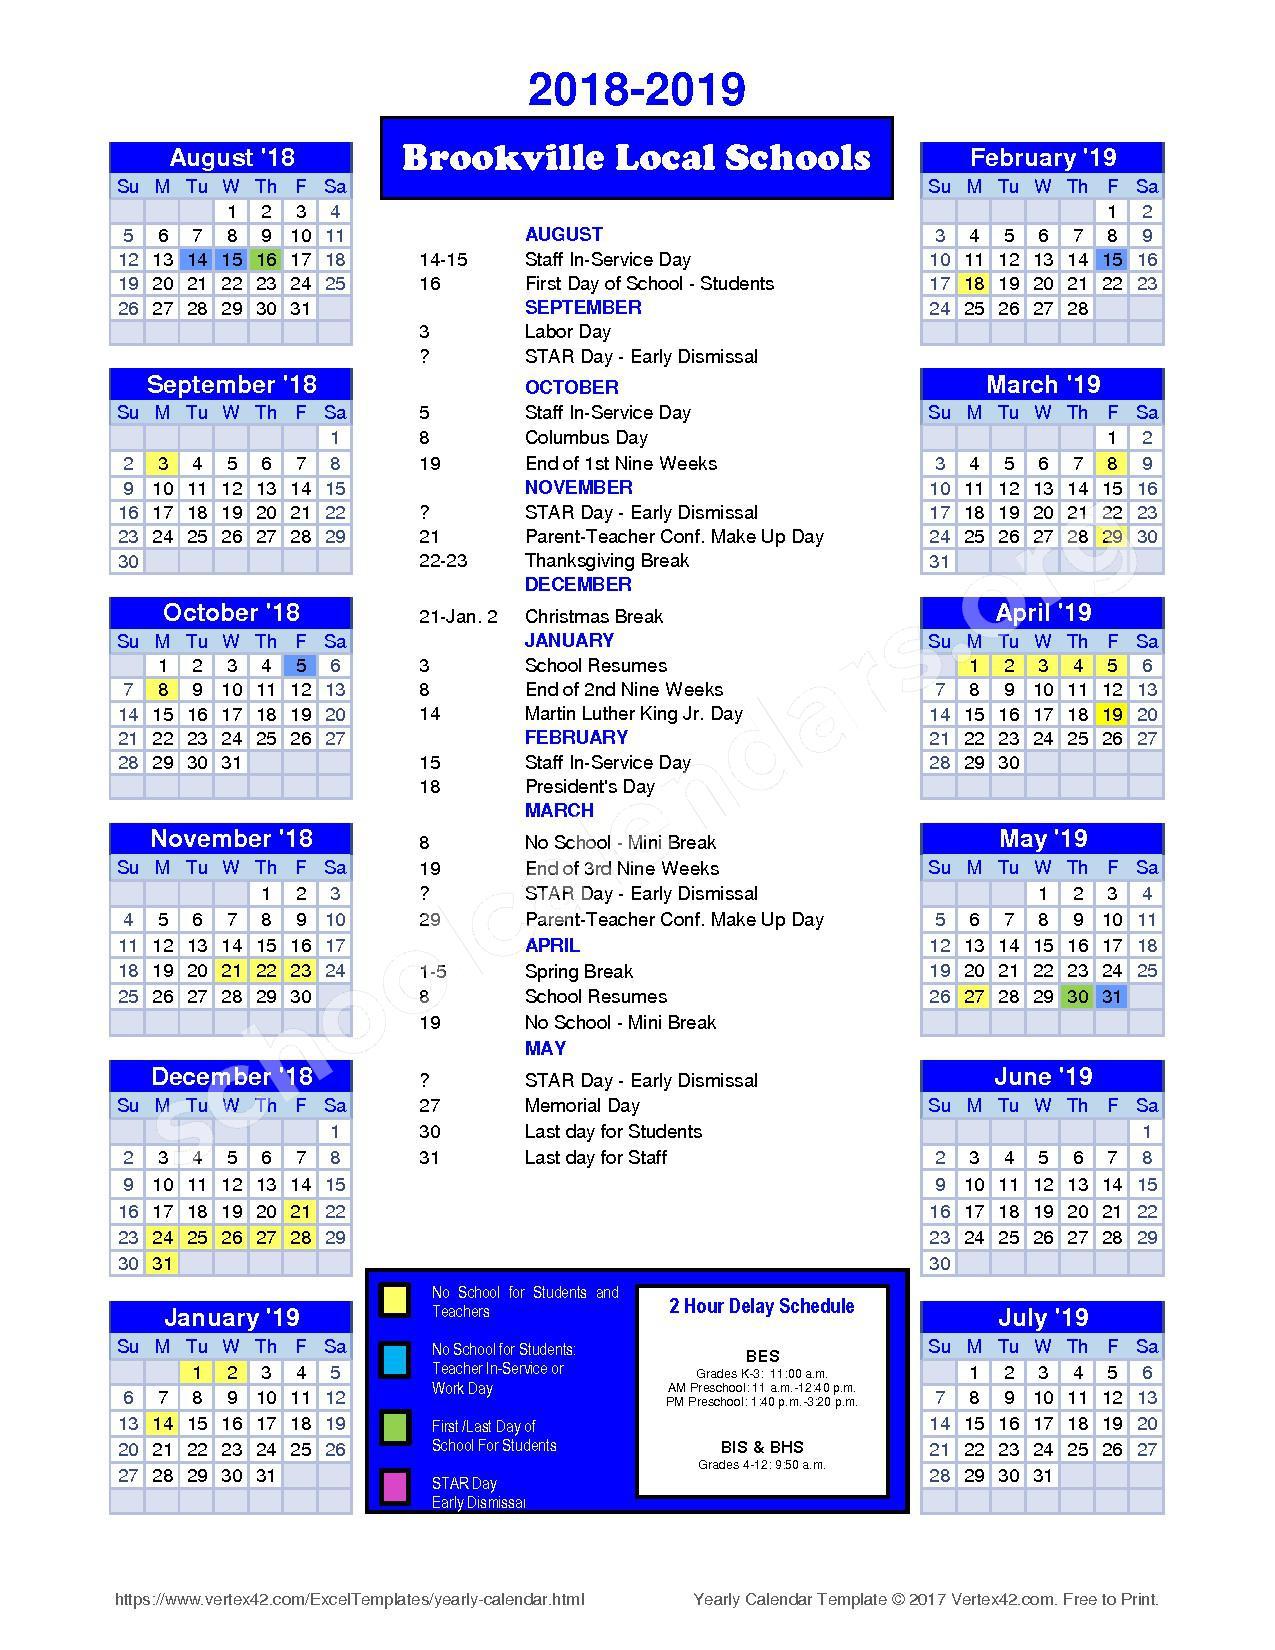 2018 - 2019 District Calendar – Brookville Local Schools – page 1